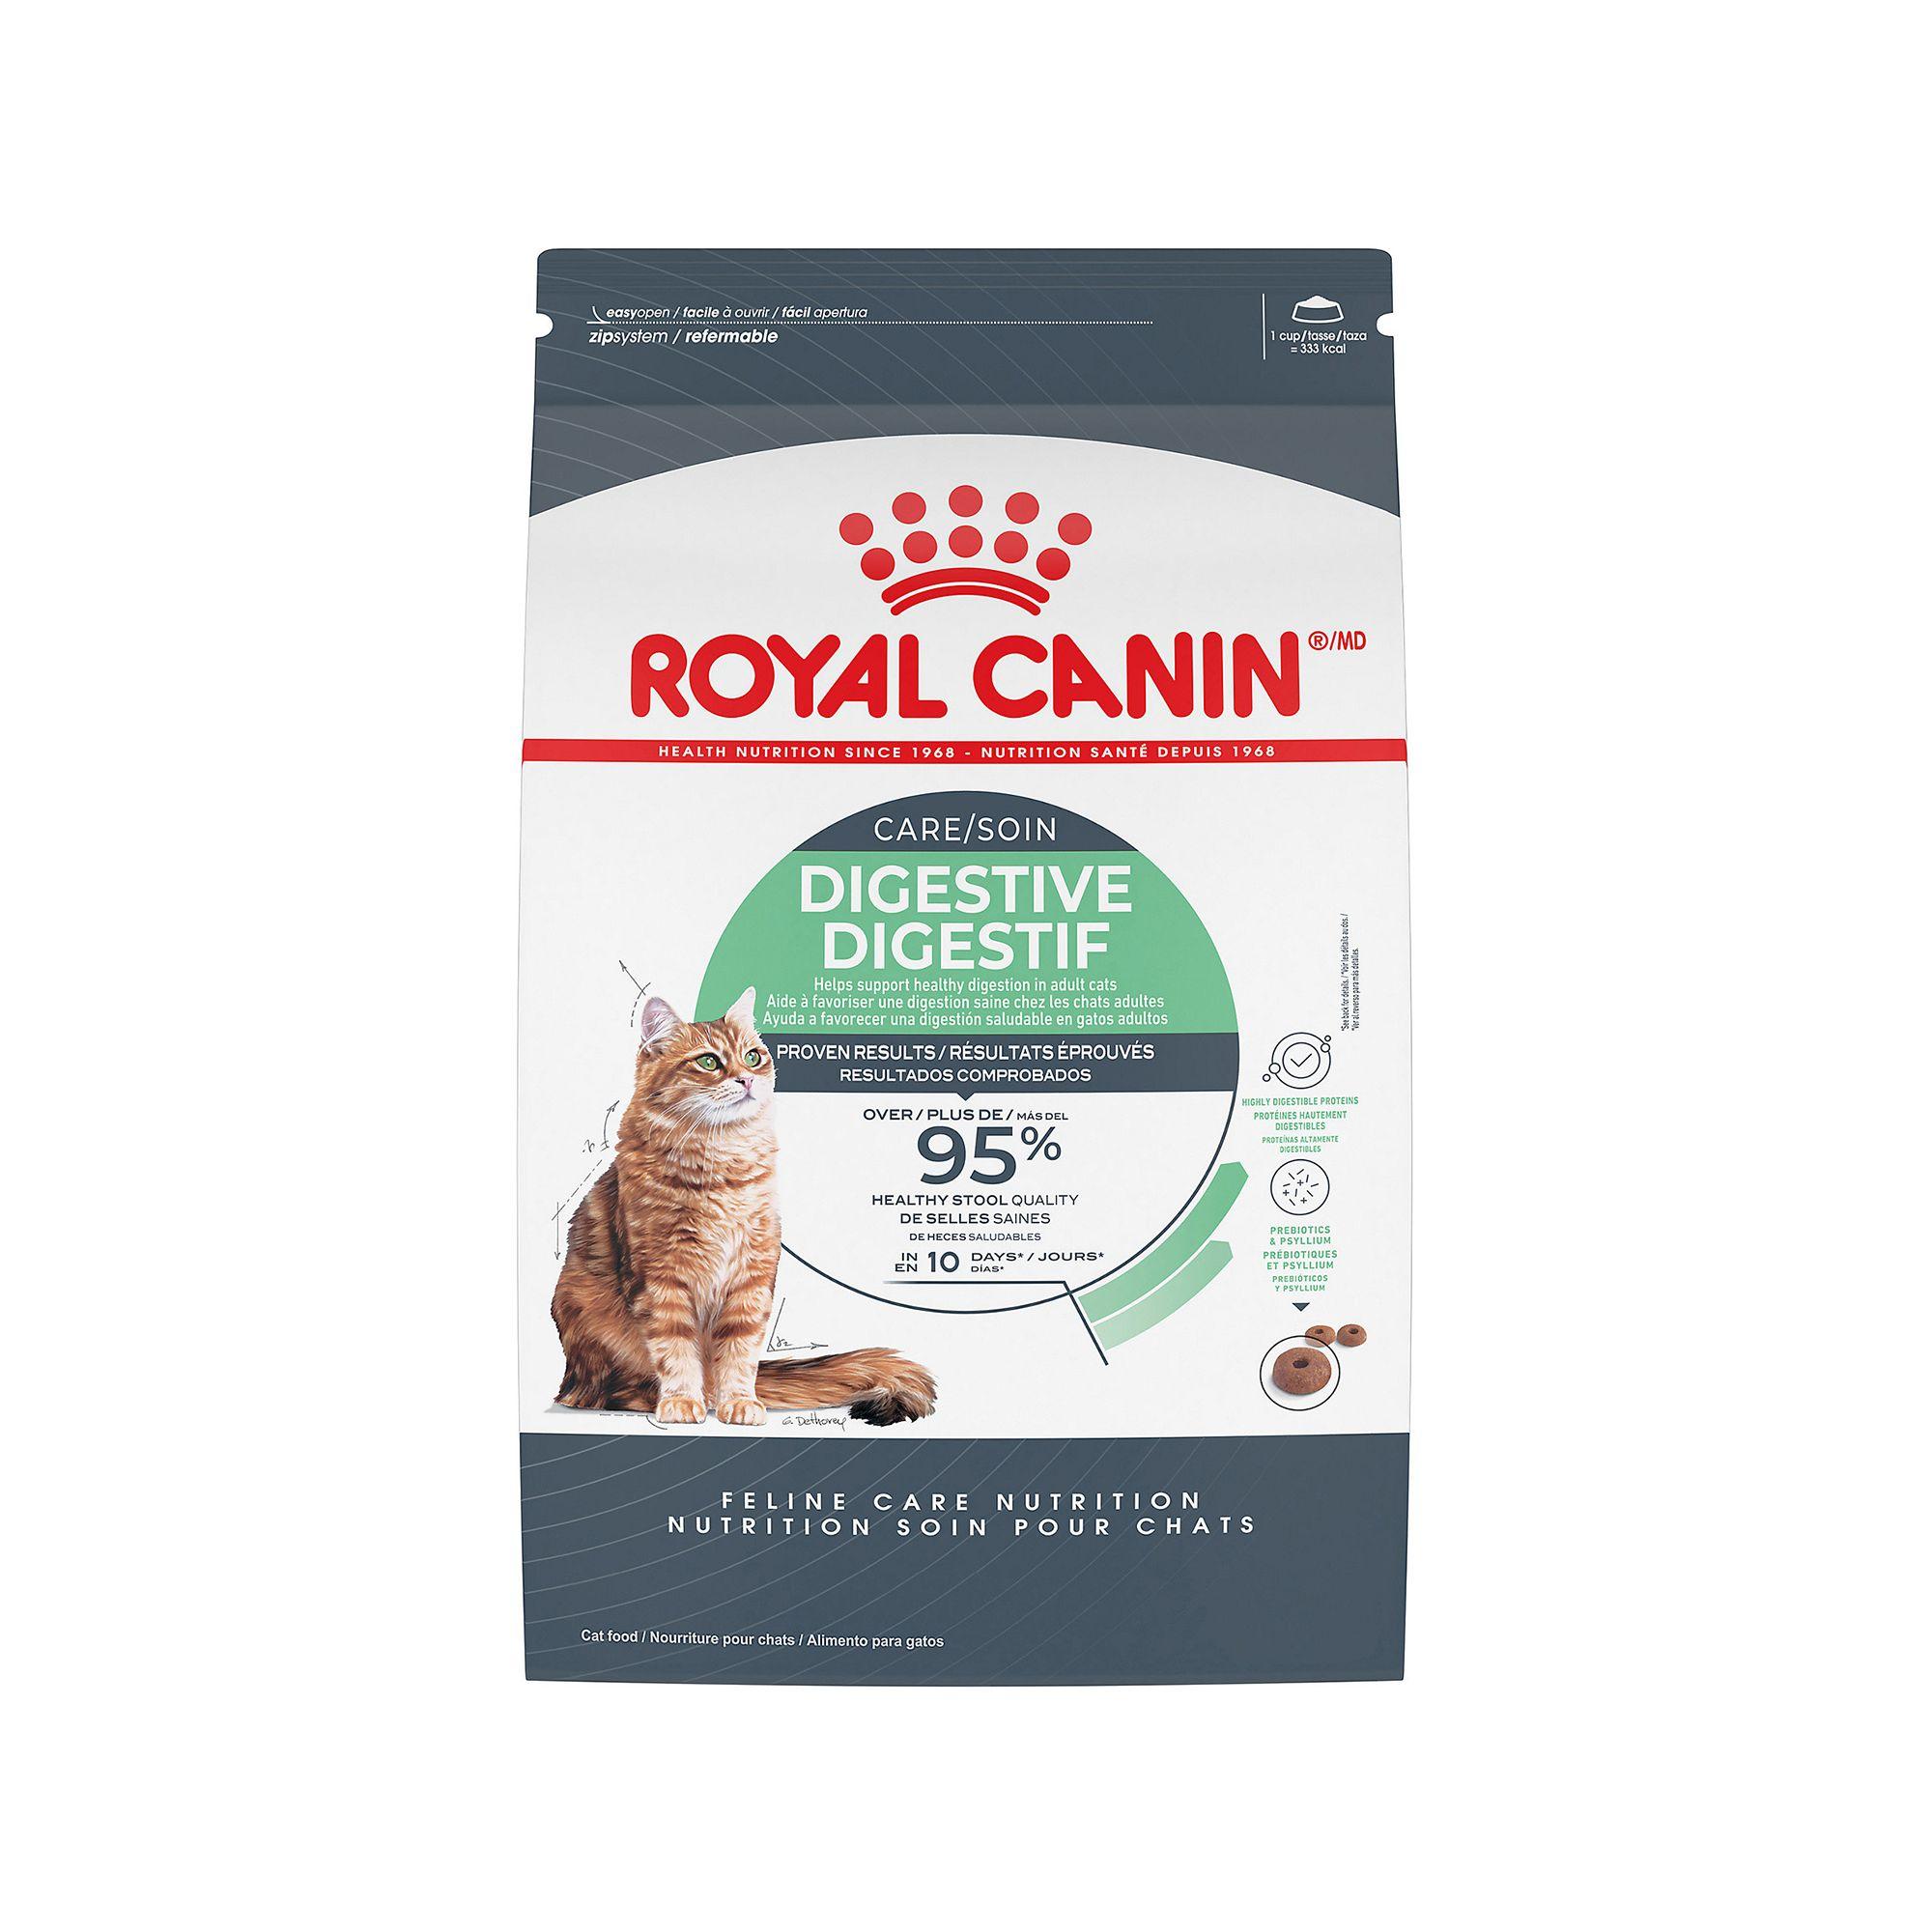 Royal canin cat food coupons 2019